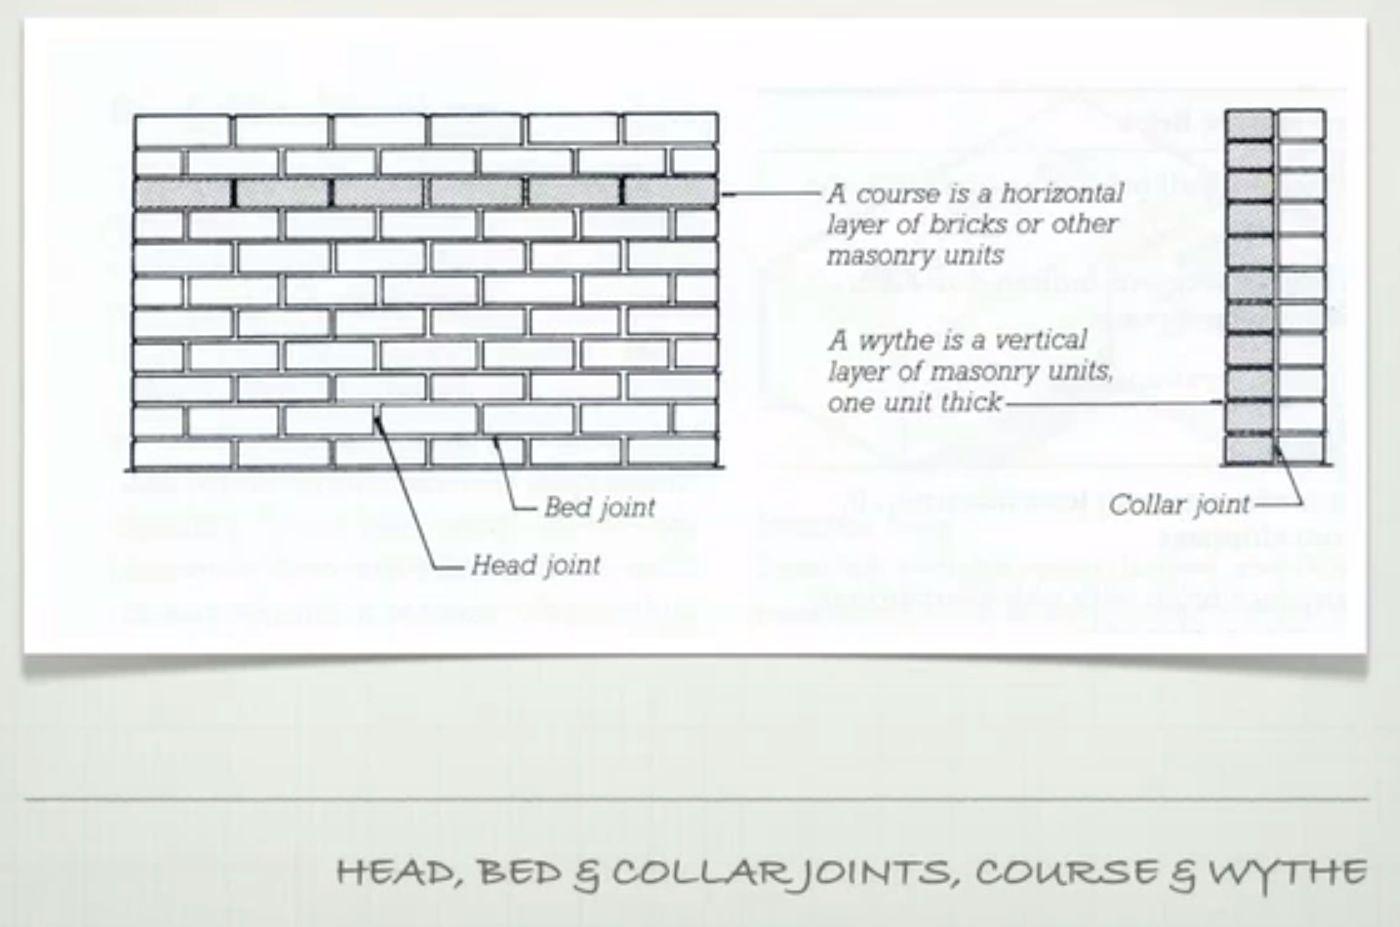 Brick joint types are 40 bdcs pinterest bricks brick joint types geenschuldenfo Choice Image